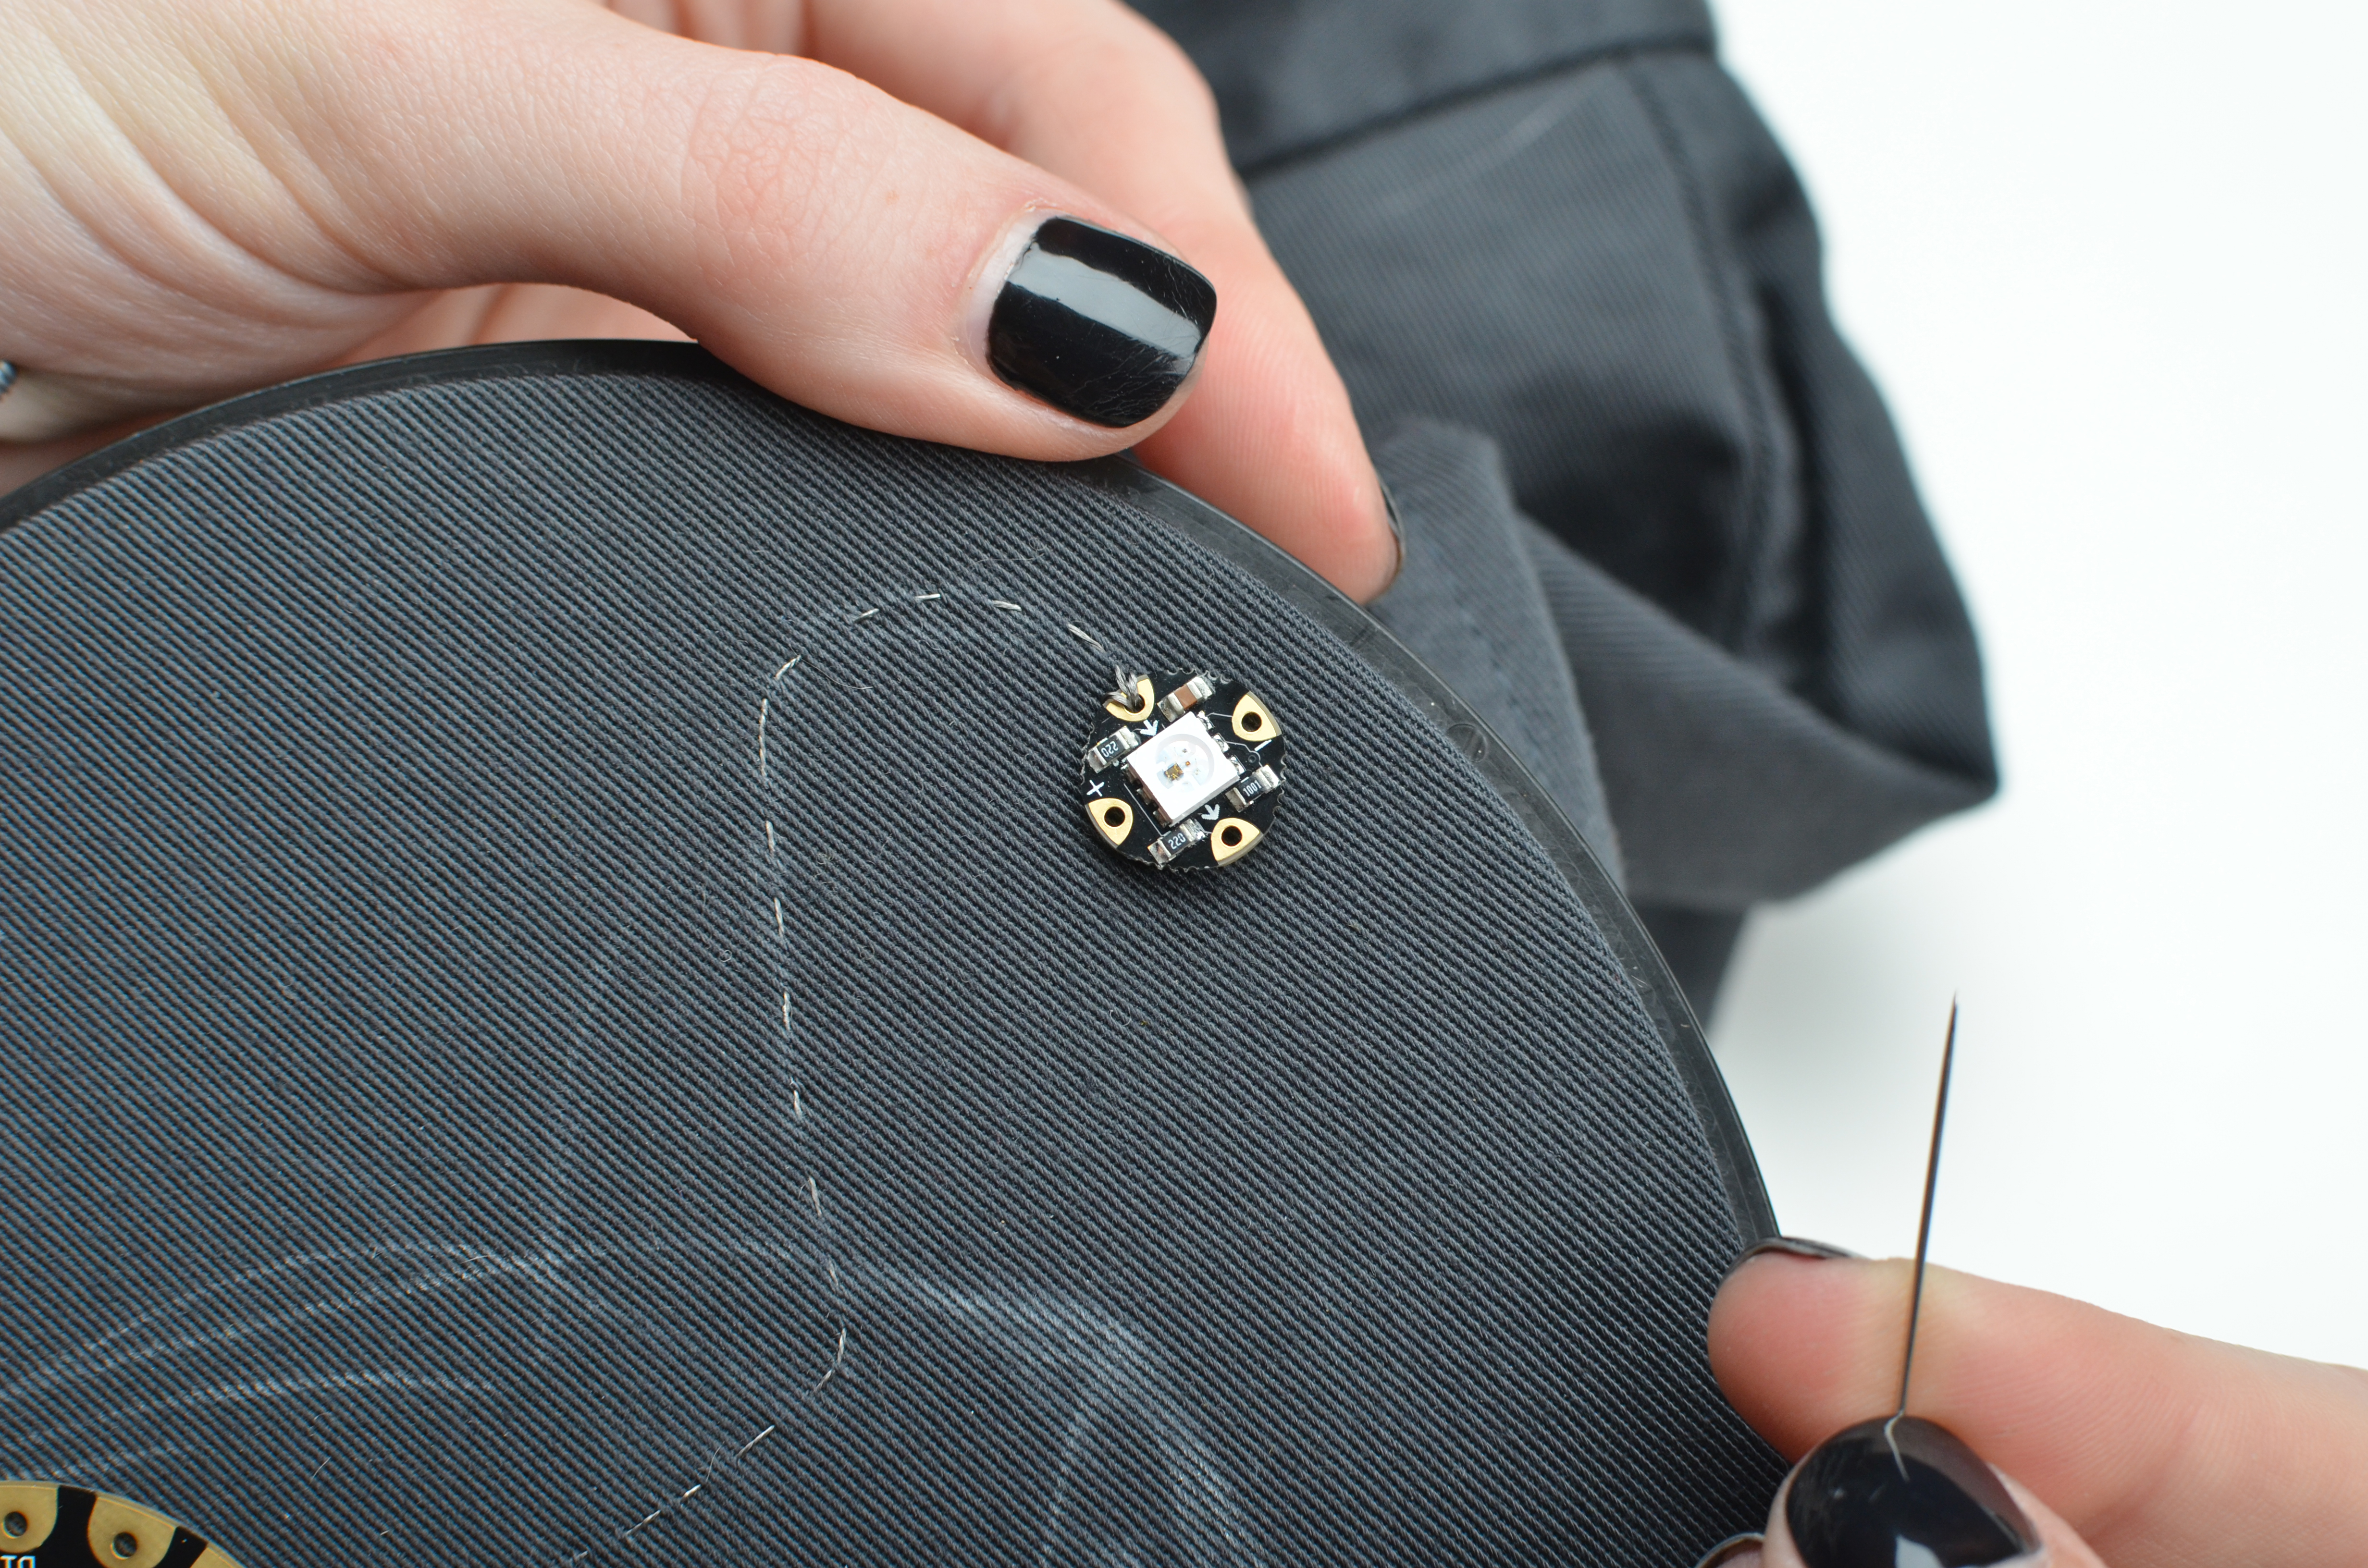 flora-angler-embroidery-11.jpg